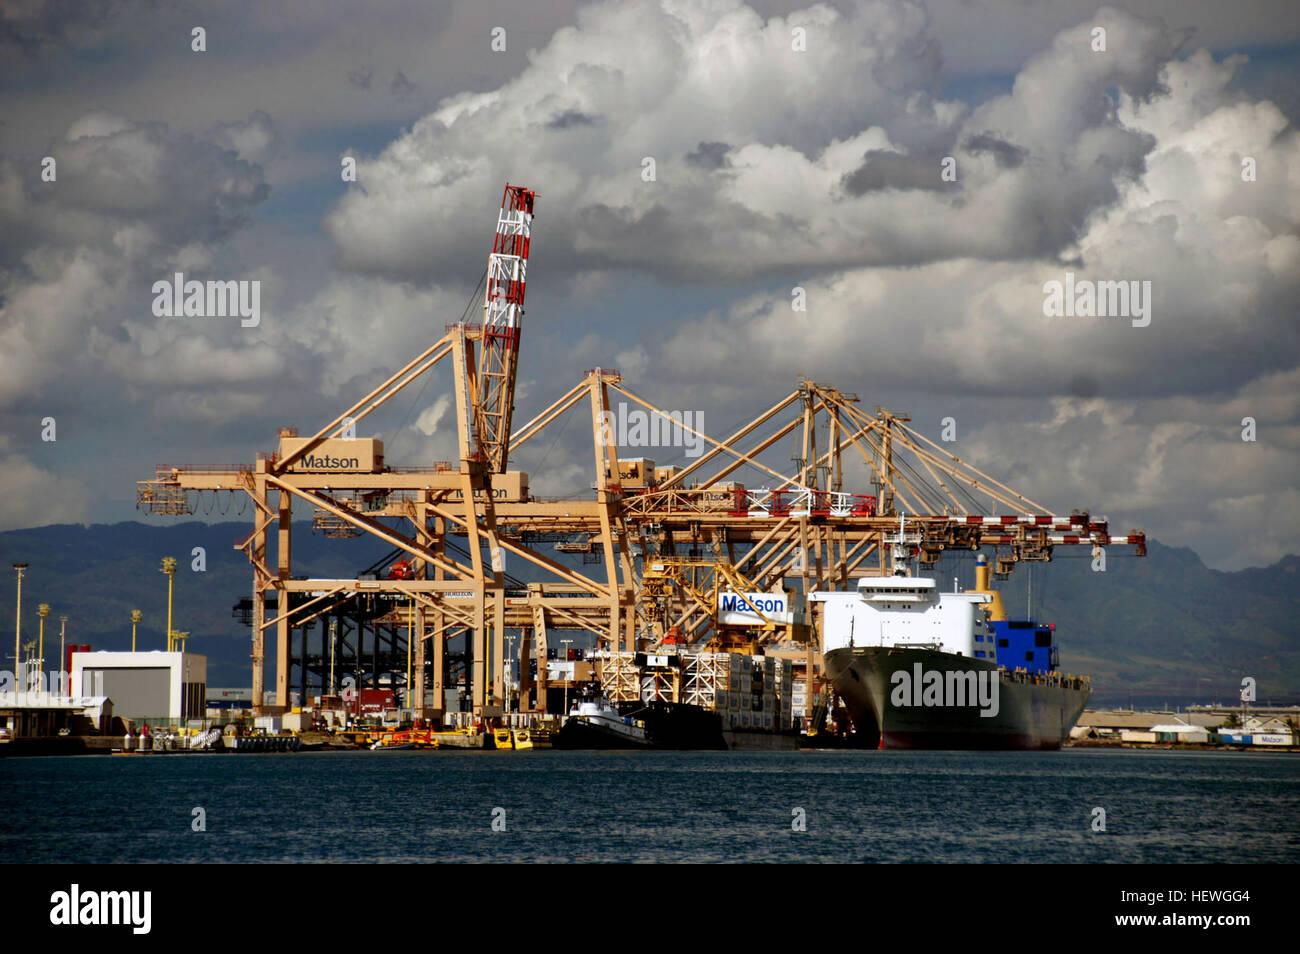 Honolulu Harbor, also called Kulolia and Ke Awa O Kou, is the principal seaport of Honolulu and the State of Hawaiʻi - Stock Image